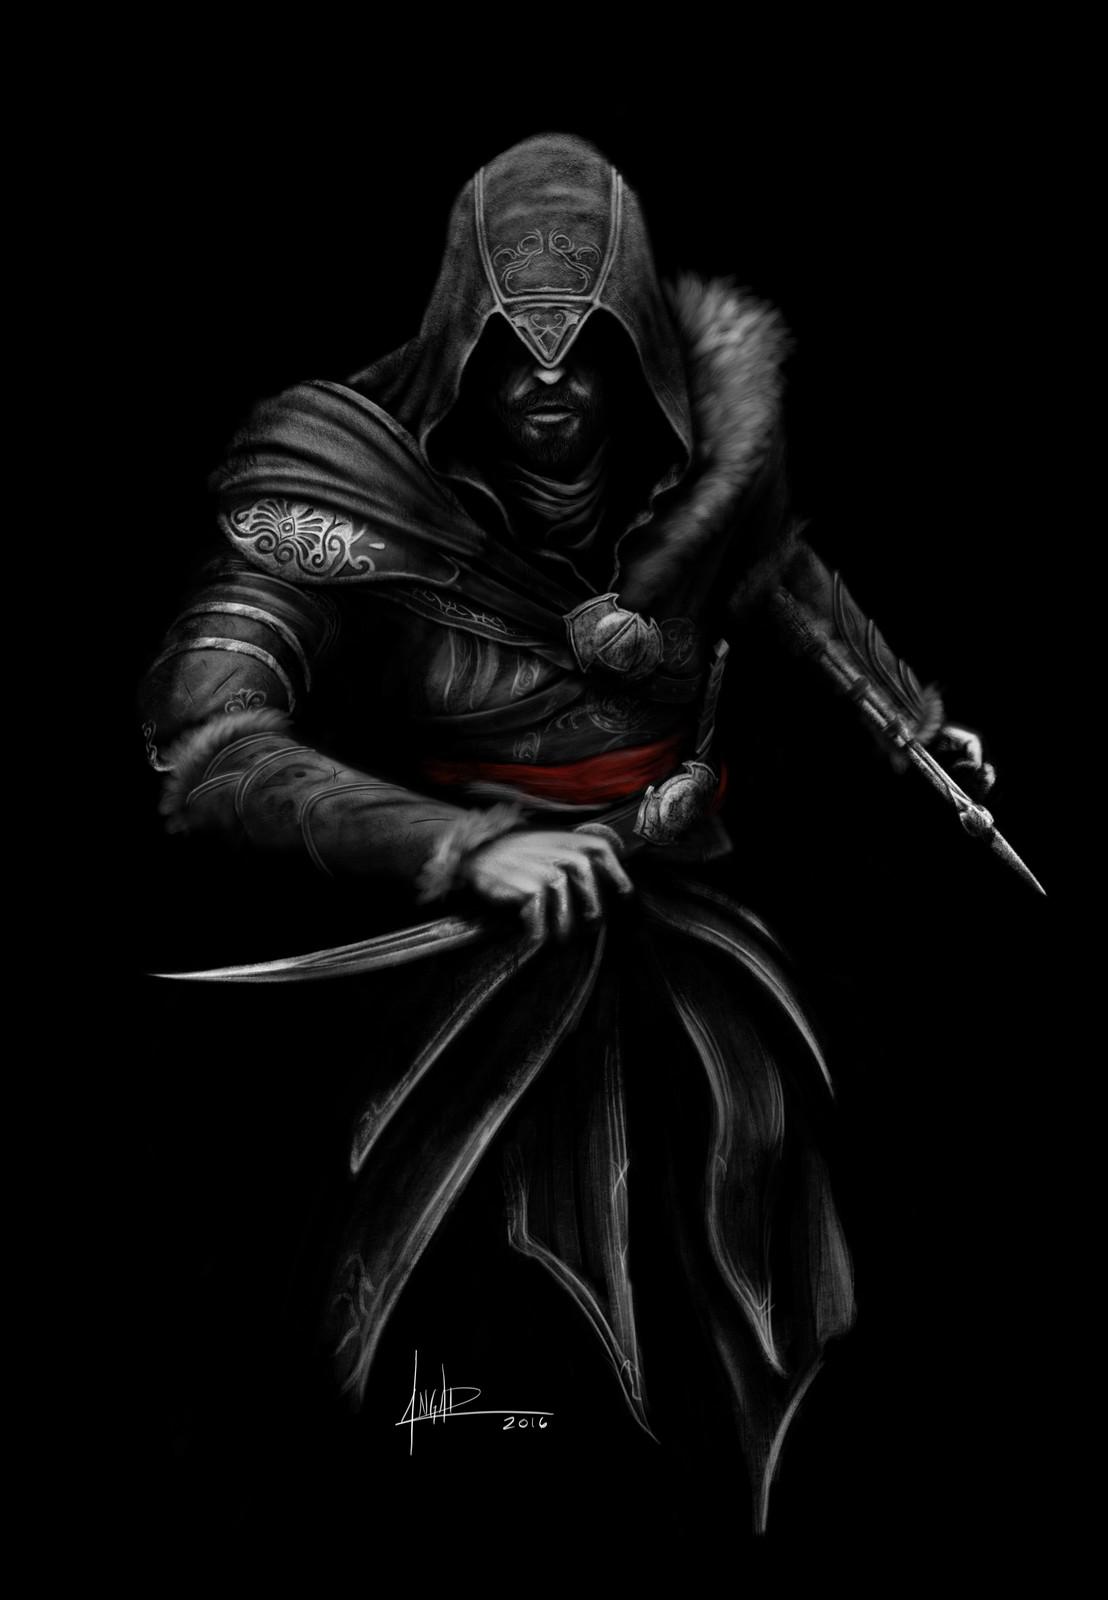 Ezio... Assassin's Creed fan art.